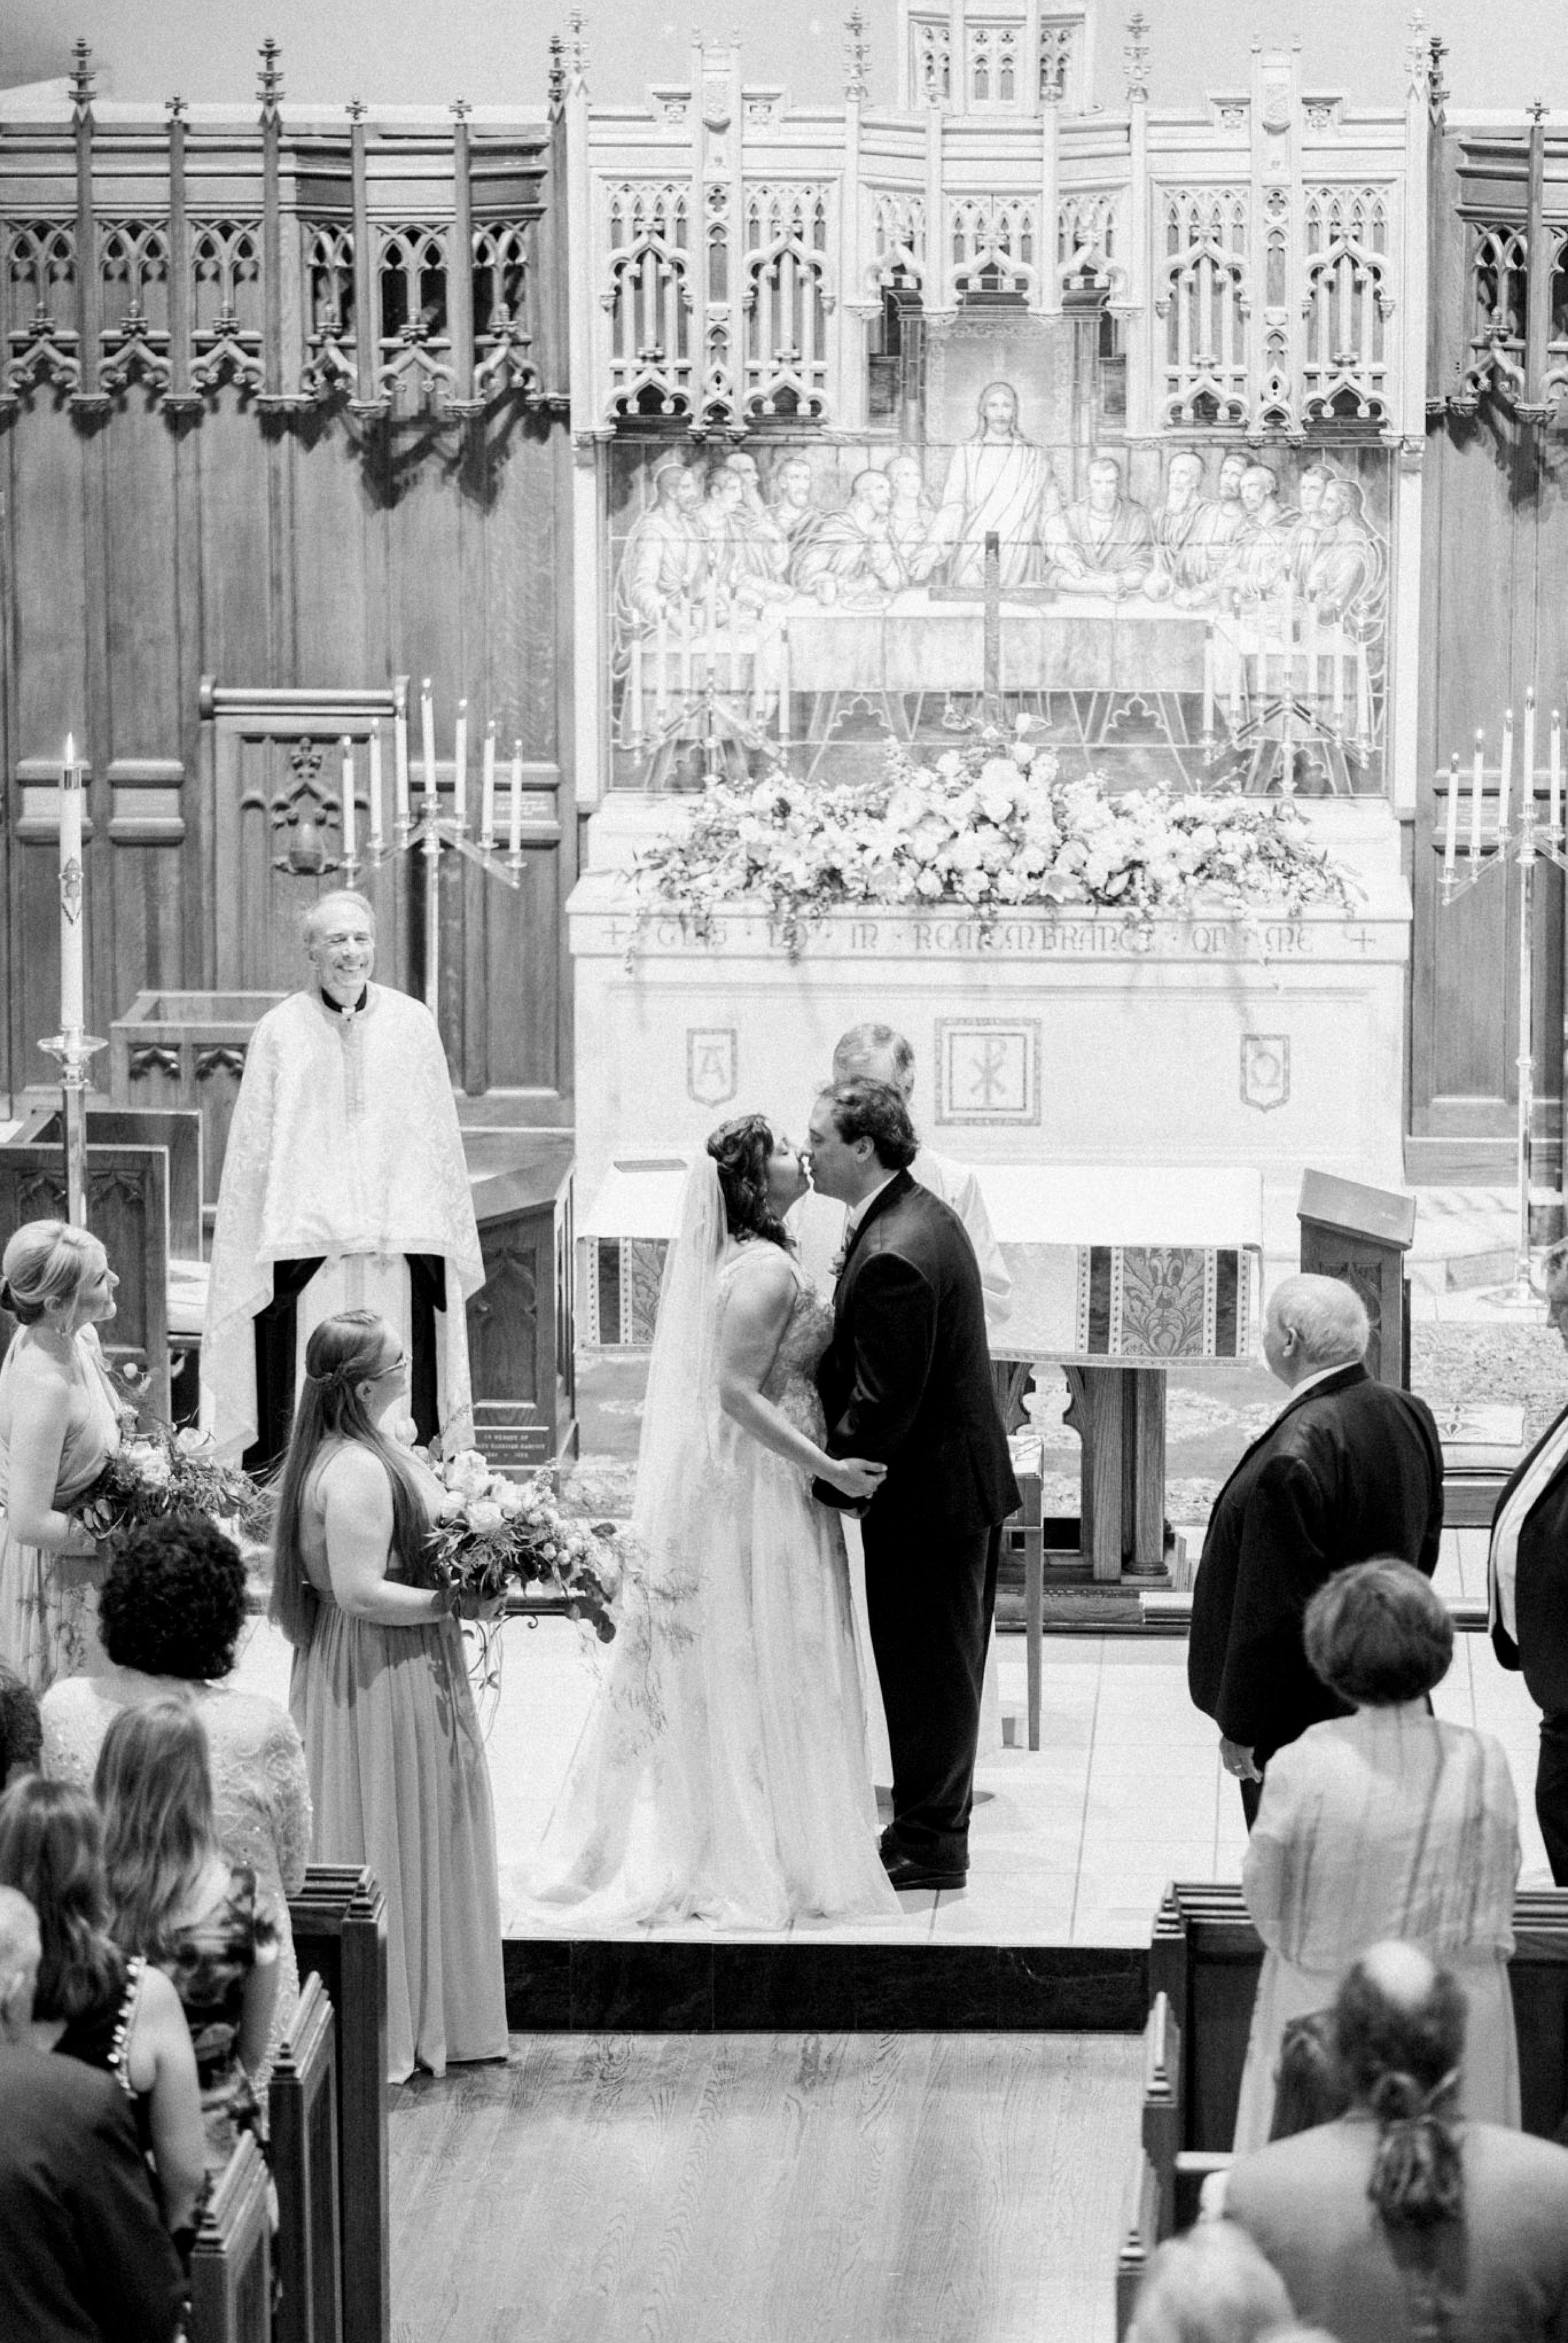 TheVirginianHotel_LynchburgVA_TheVirginianHotelWedding_Virginiaweddingphotographer_Lynchburgvawedding 35.jpg